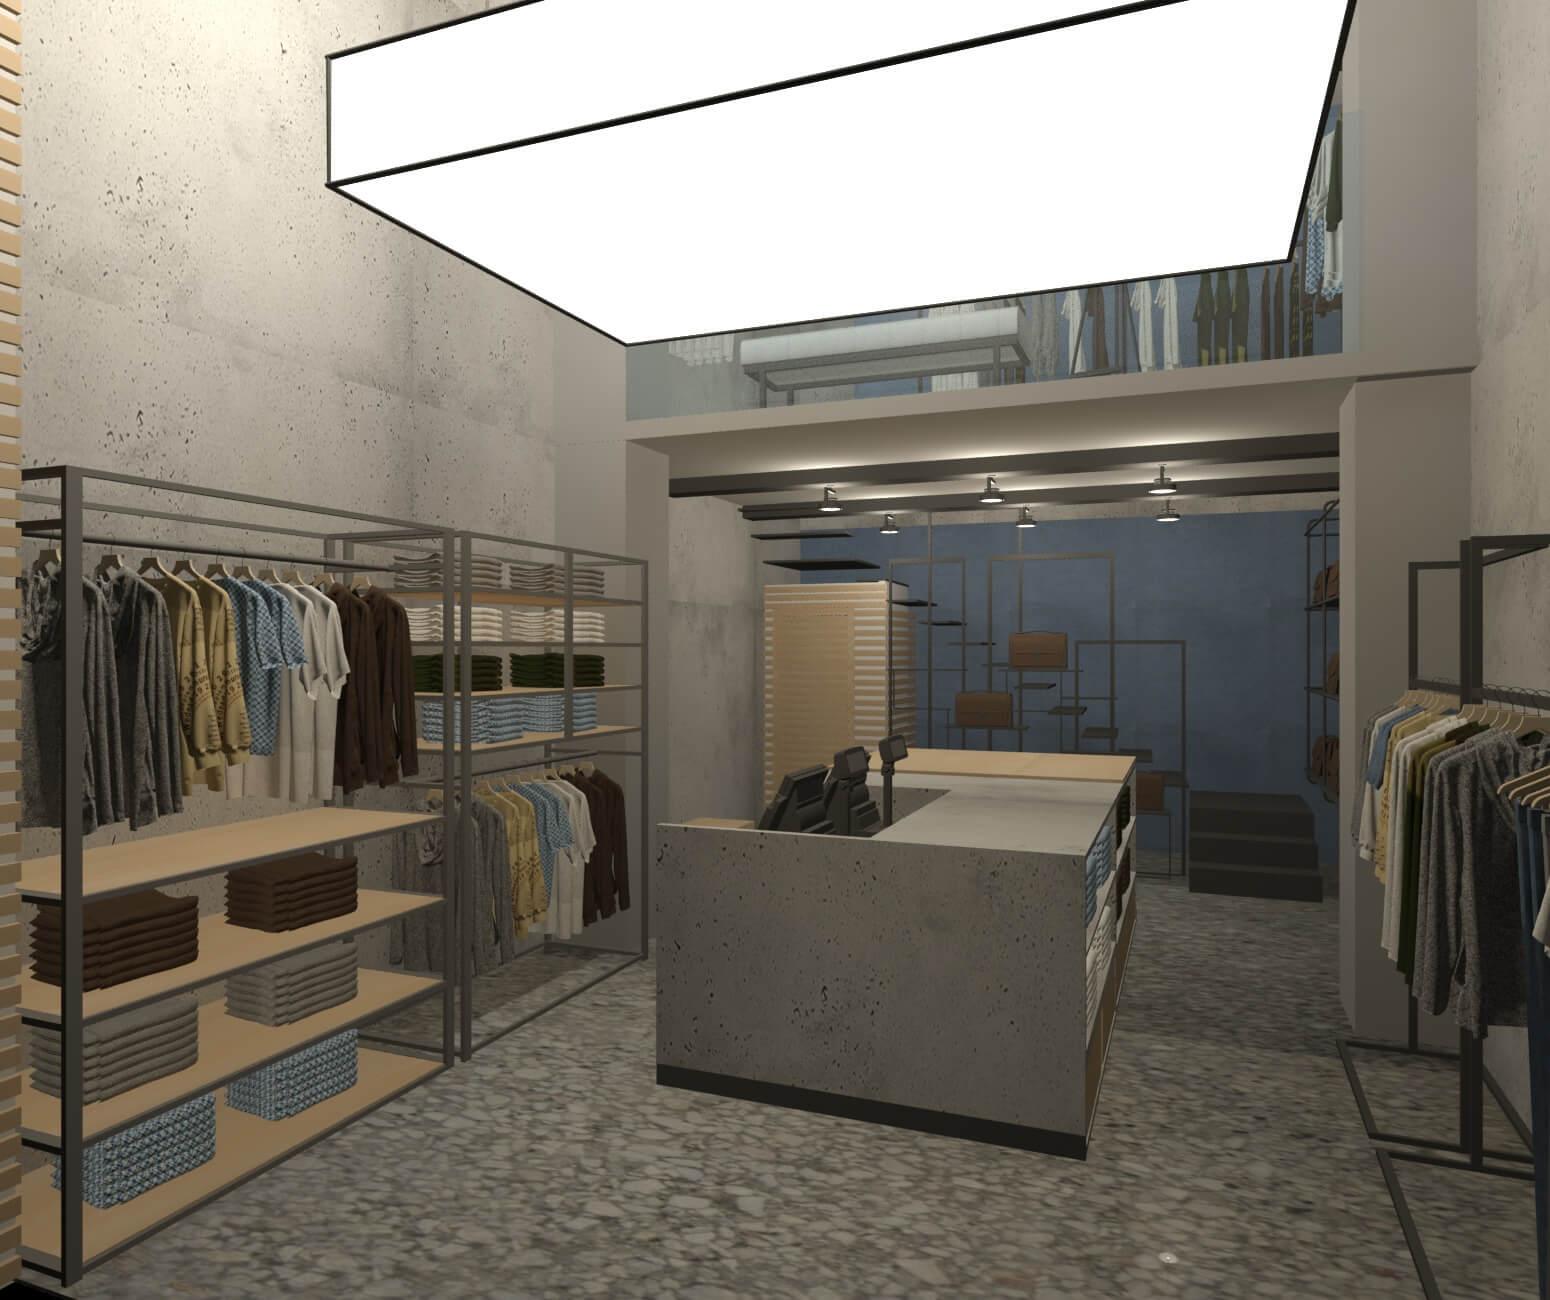 New boutique store design construction dca studio for Store building design